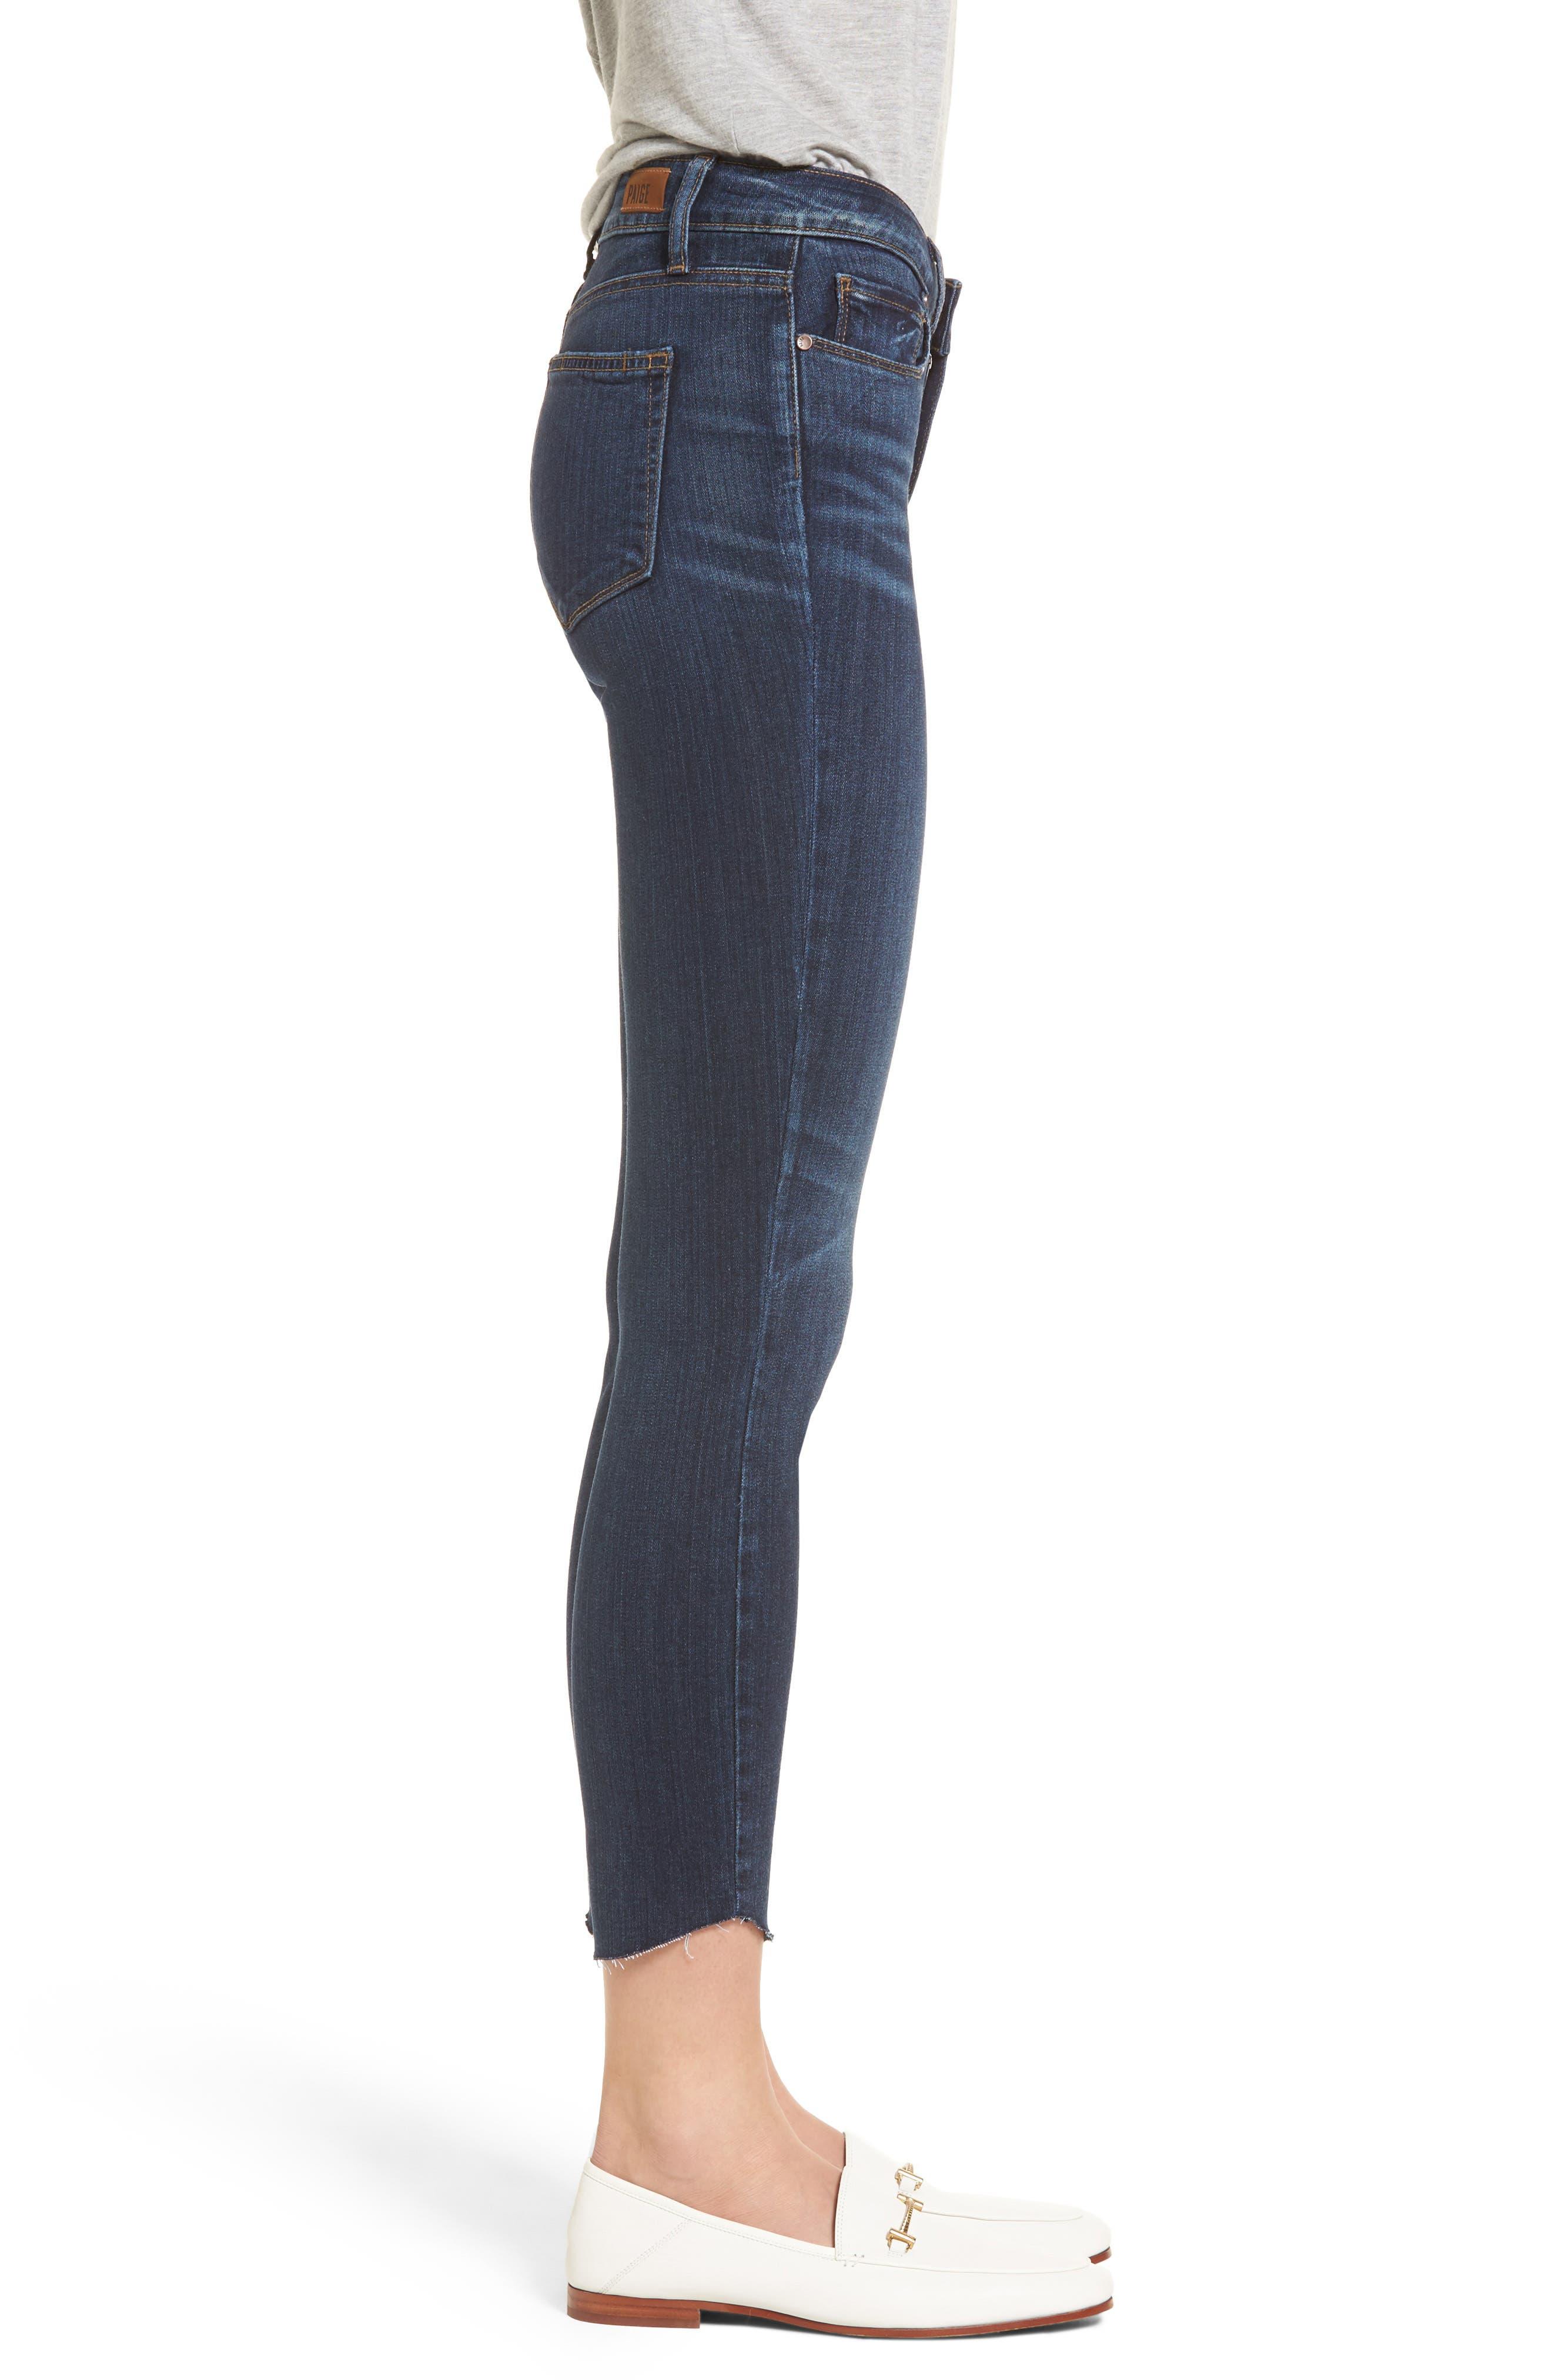 Transcend - Verdugo Ankle Ultra Skinny Jeans,                             Alternate thumbnail 3, color,                             Oaklyn